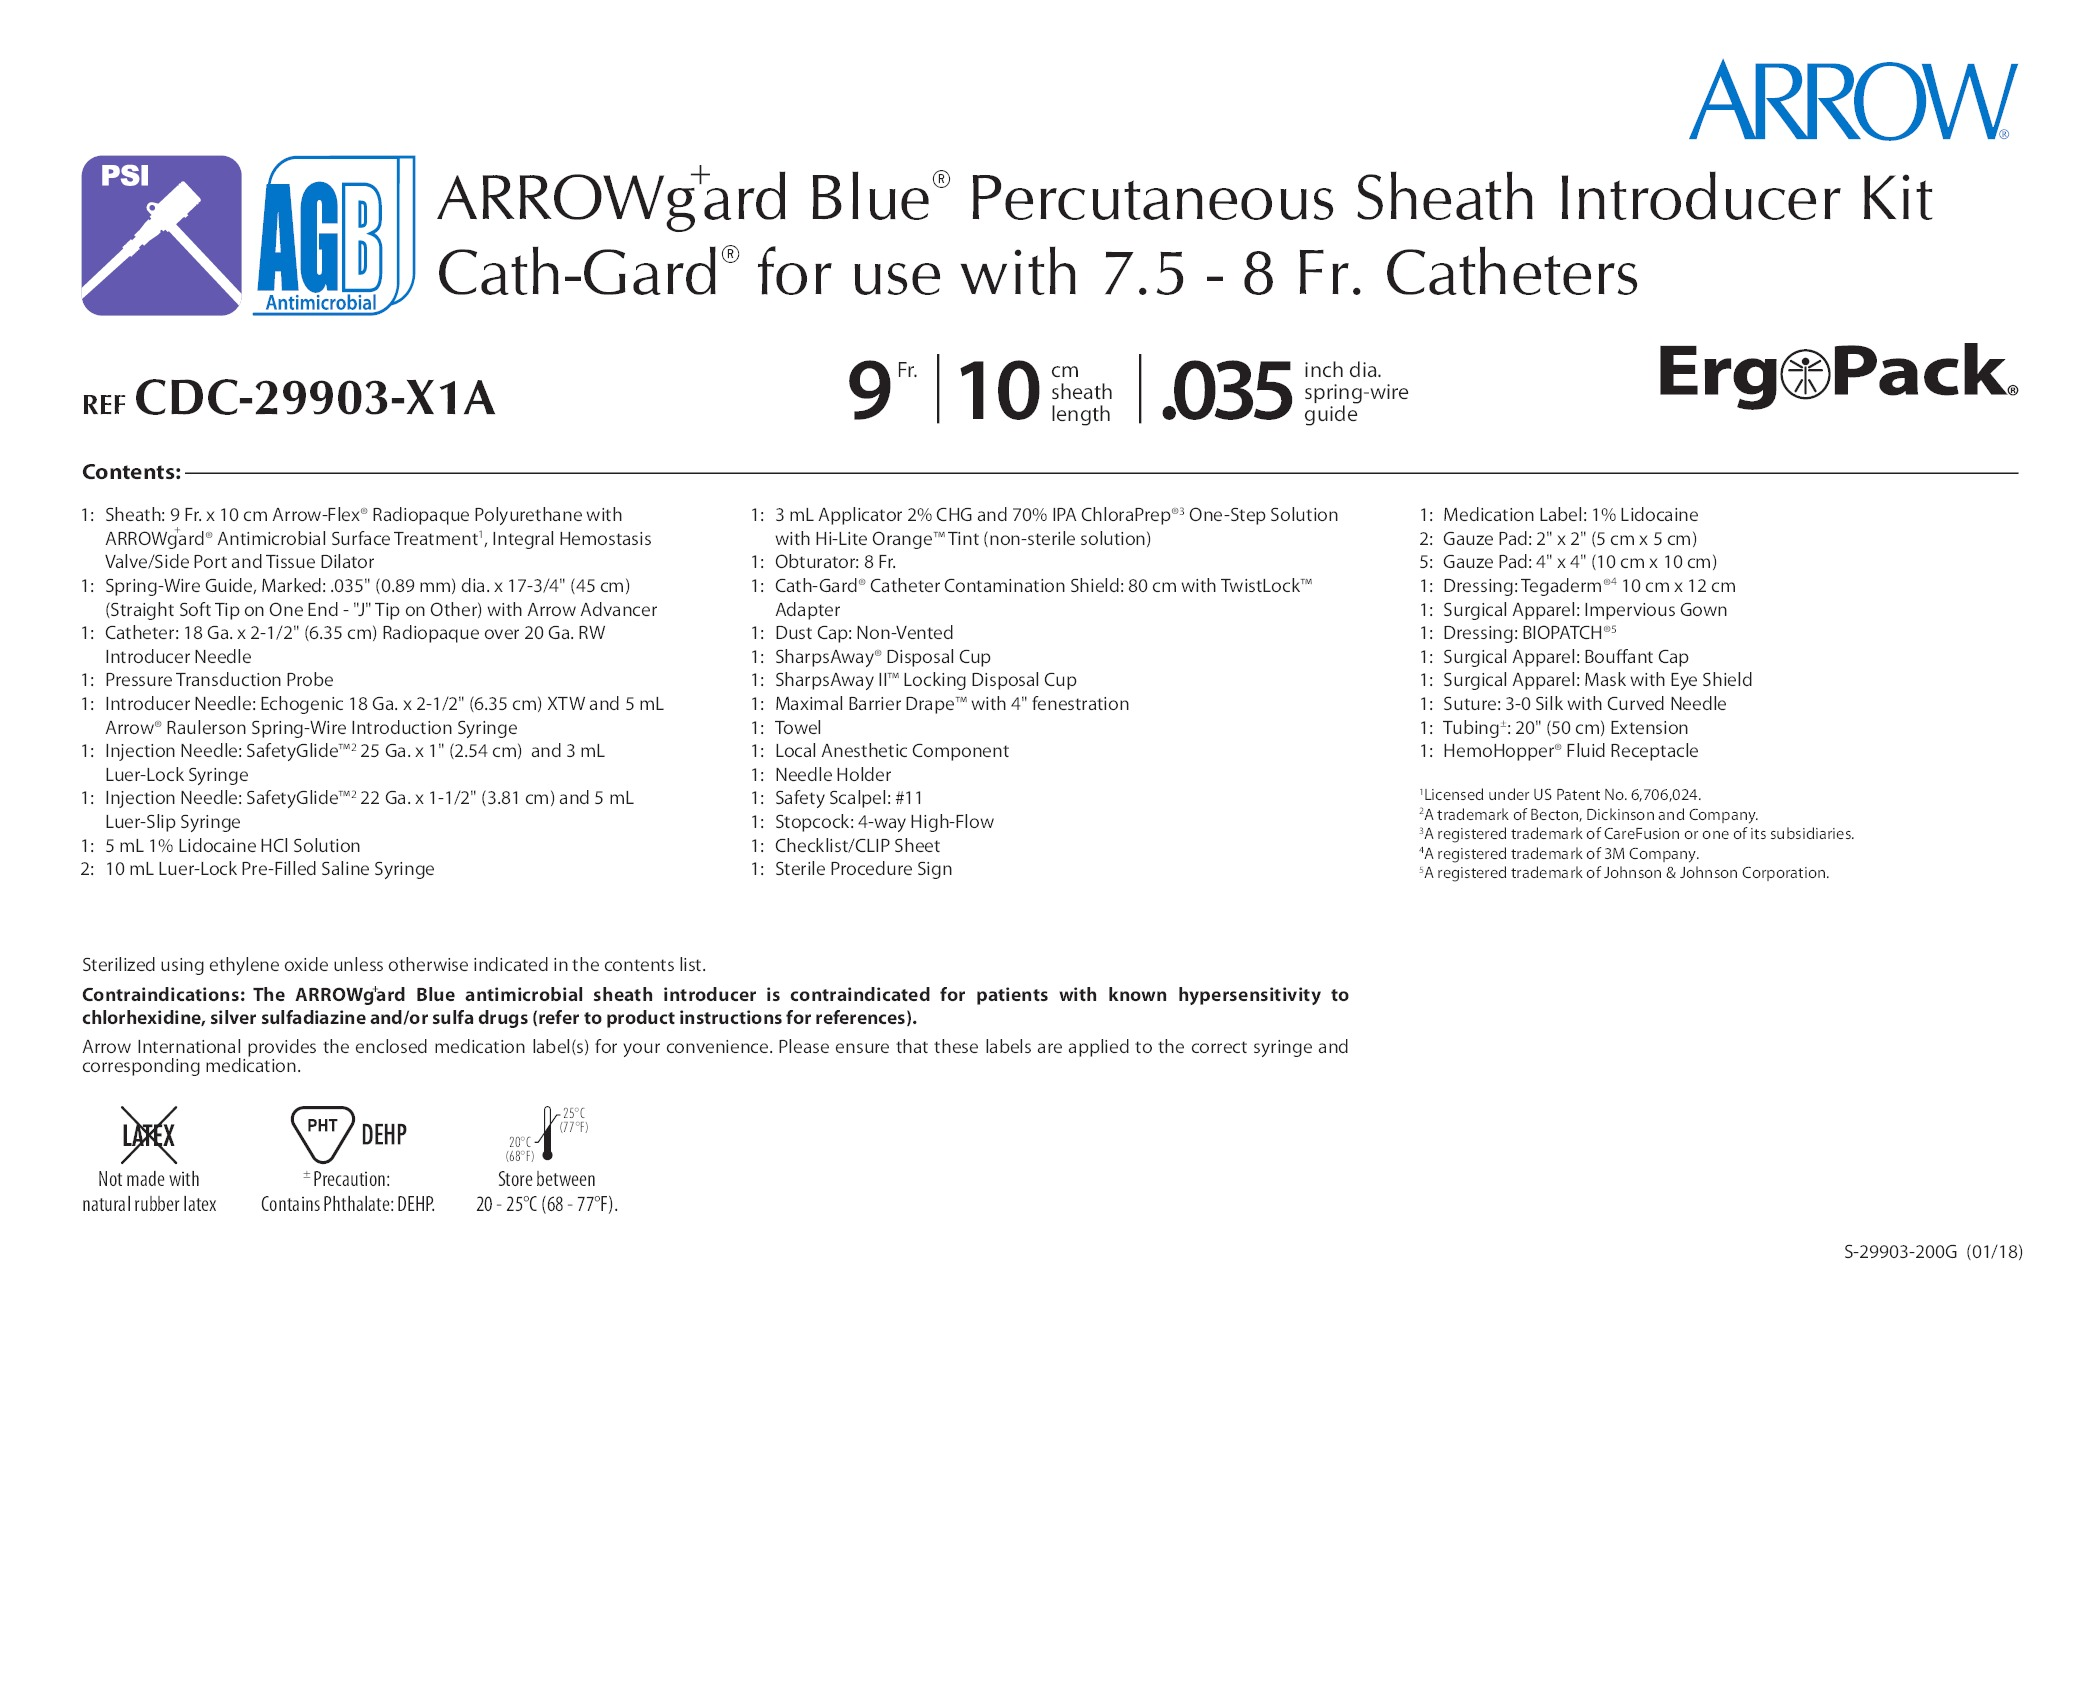 CDC-29903-X1A - Teleflex Incorporated - Vascular Access